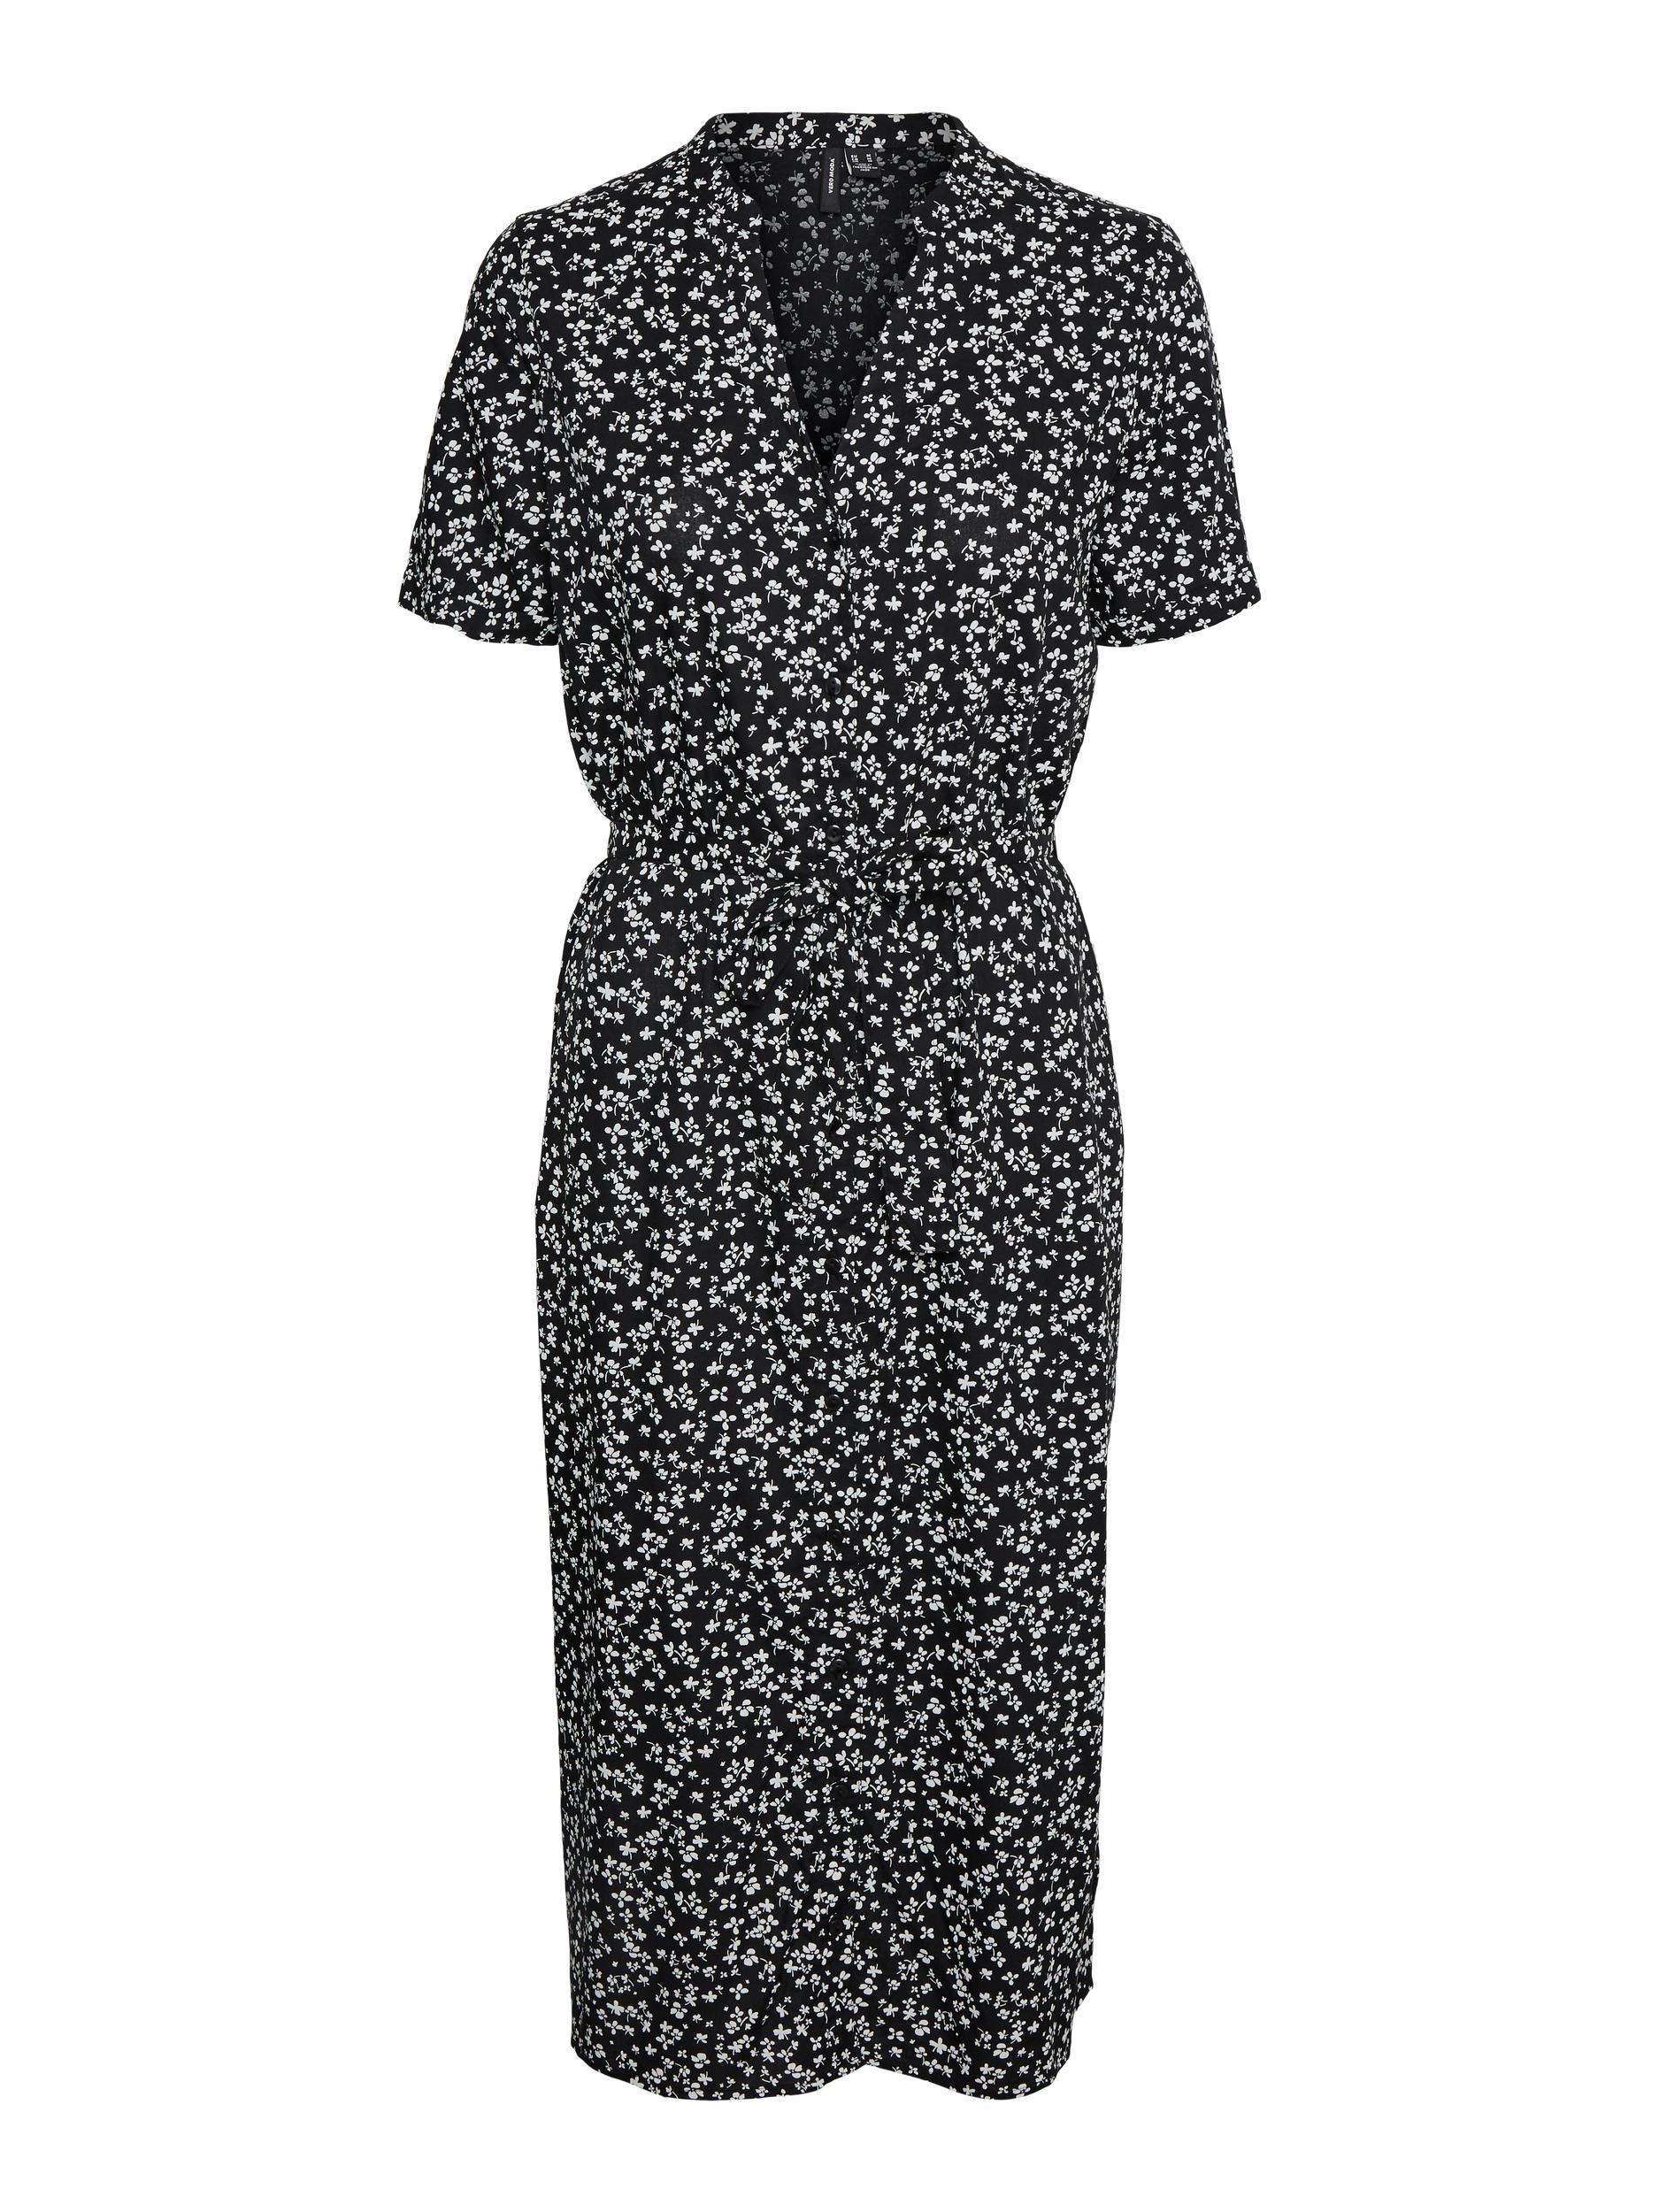 Vero Moda Simone midi-kjole, black/clover, small